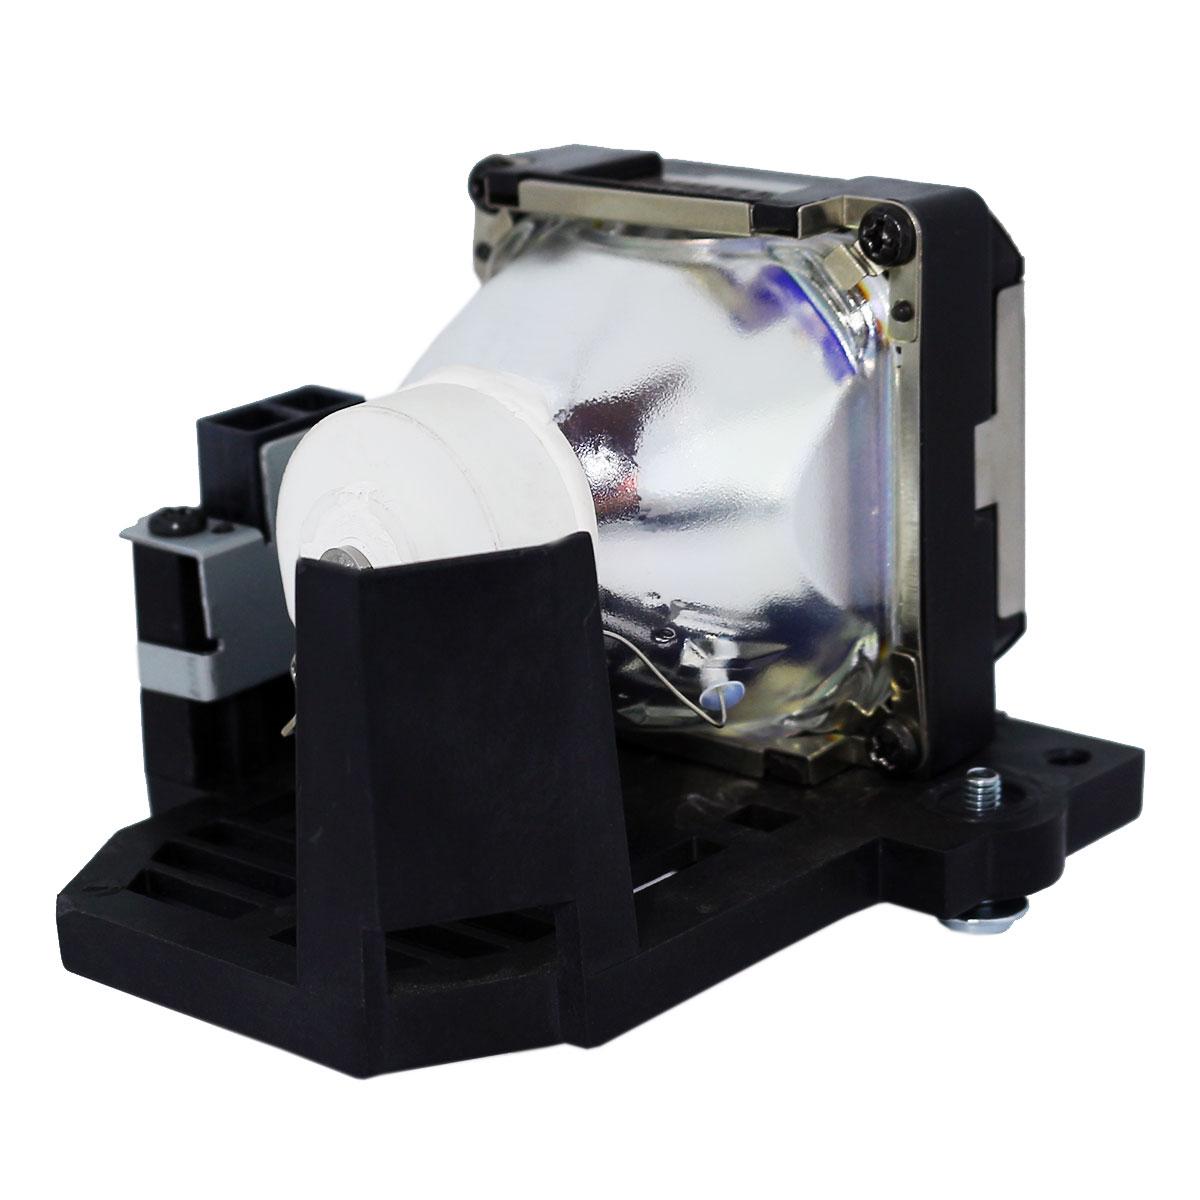 replacement pk l2210up bulb cartrdige for jvc dla x70 dlax70 projector. Black Bedroom Furniture Sets. Home Design Ideas